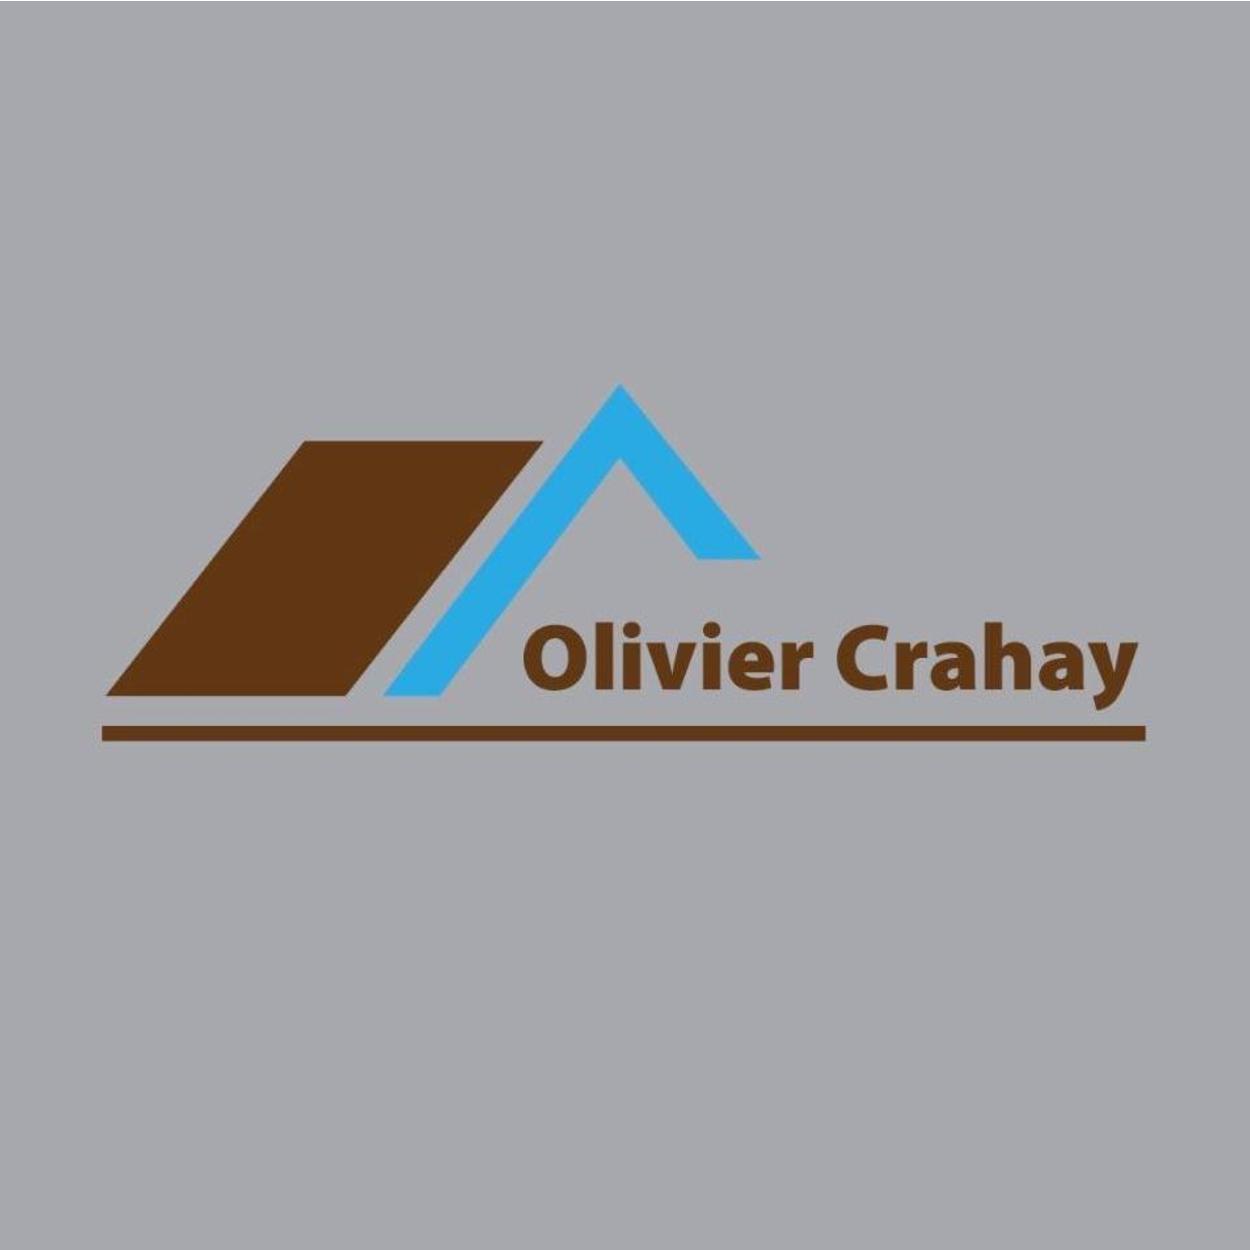 Olivier Crahay